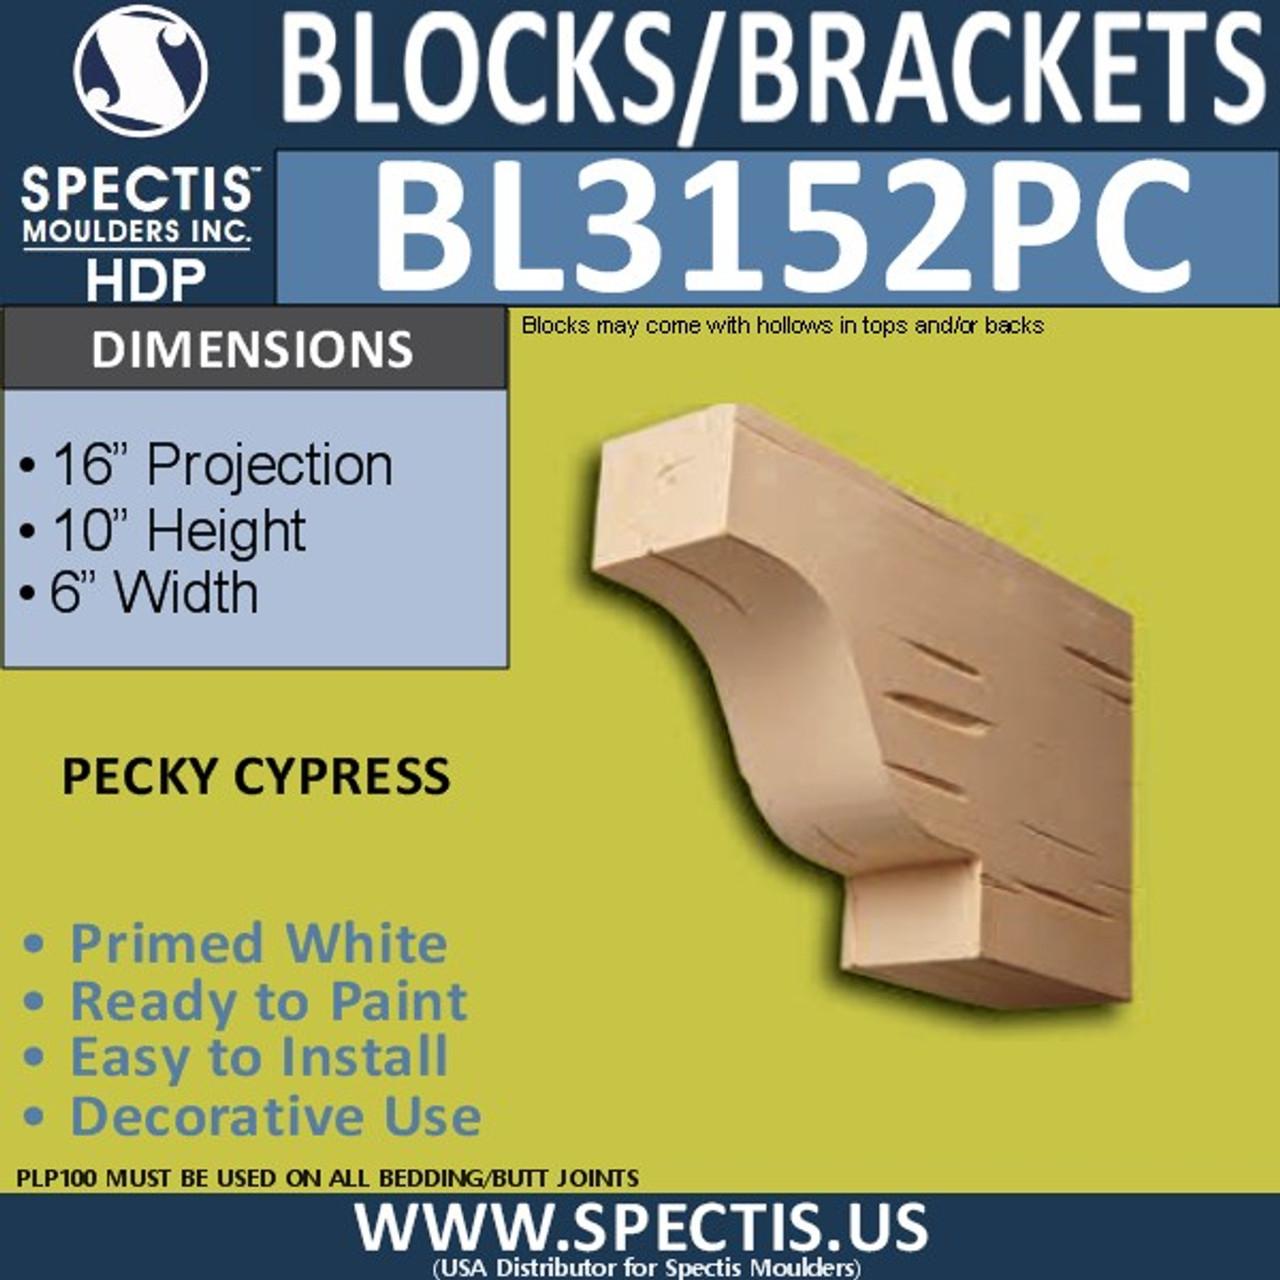 "BL3152PC Pecky Cypress Eave Block or Bracket 6""W x 10""H x 16""P"